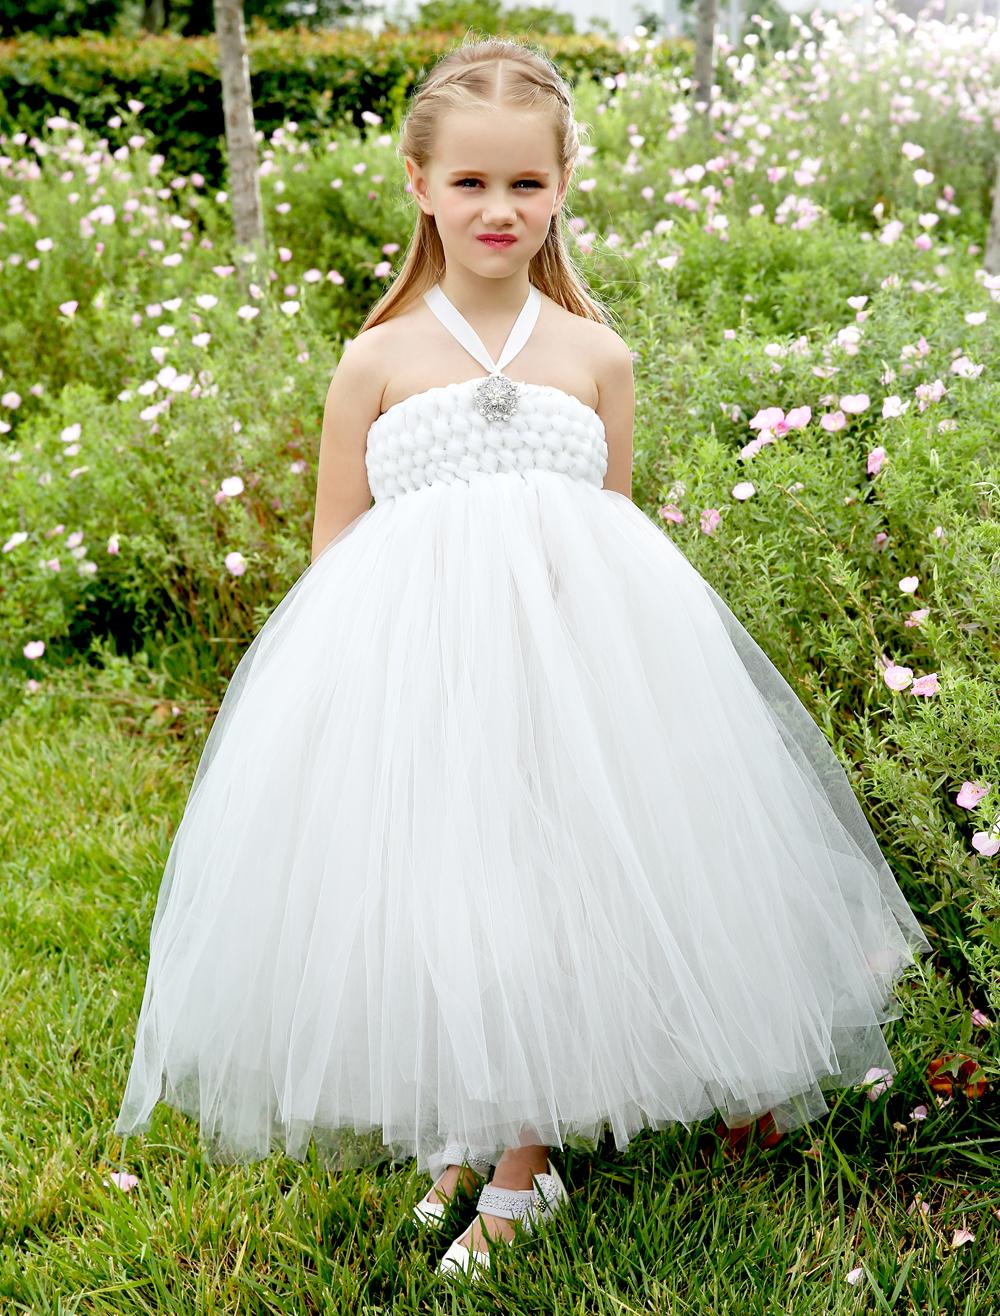 Fashion Ivory little girls dresses with rhinestones elegant kids girls Pageant Dress formal wedding flower girl dresses<br><br>Aliexpress